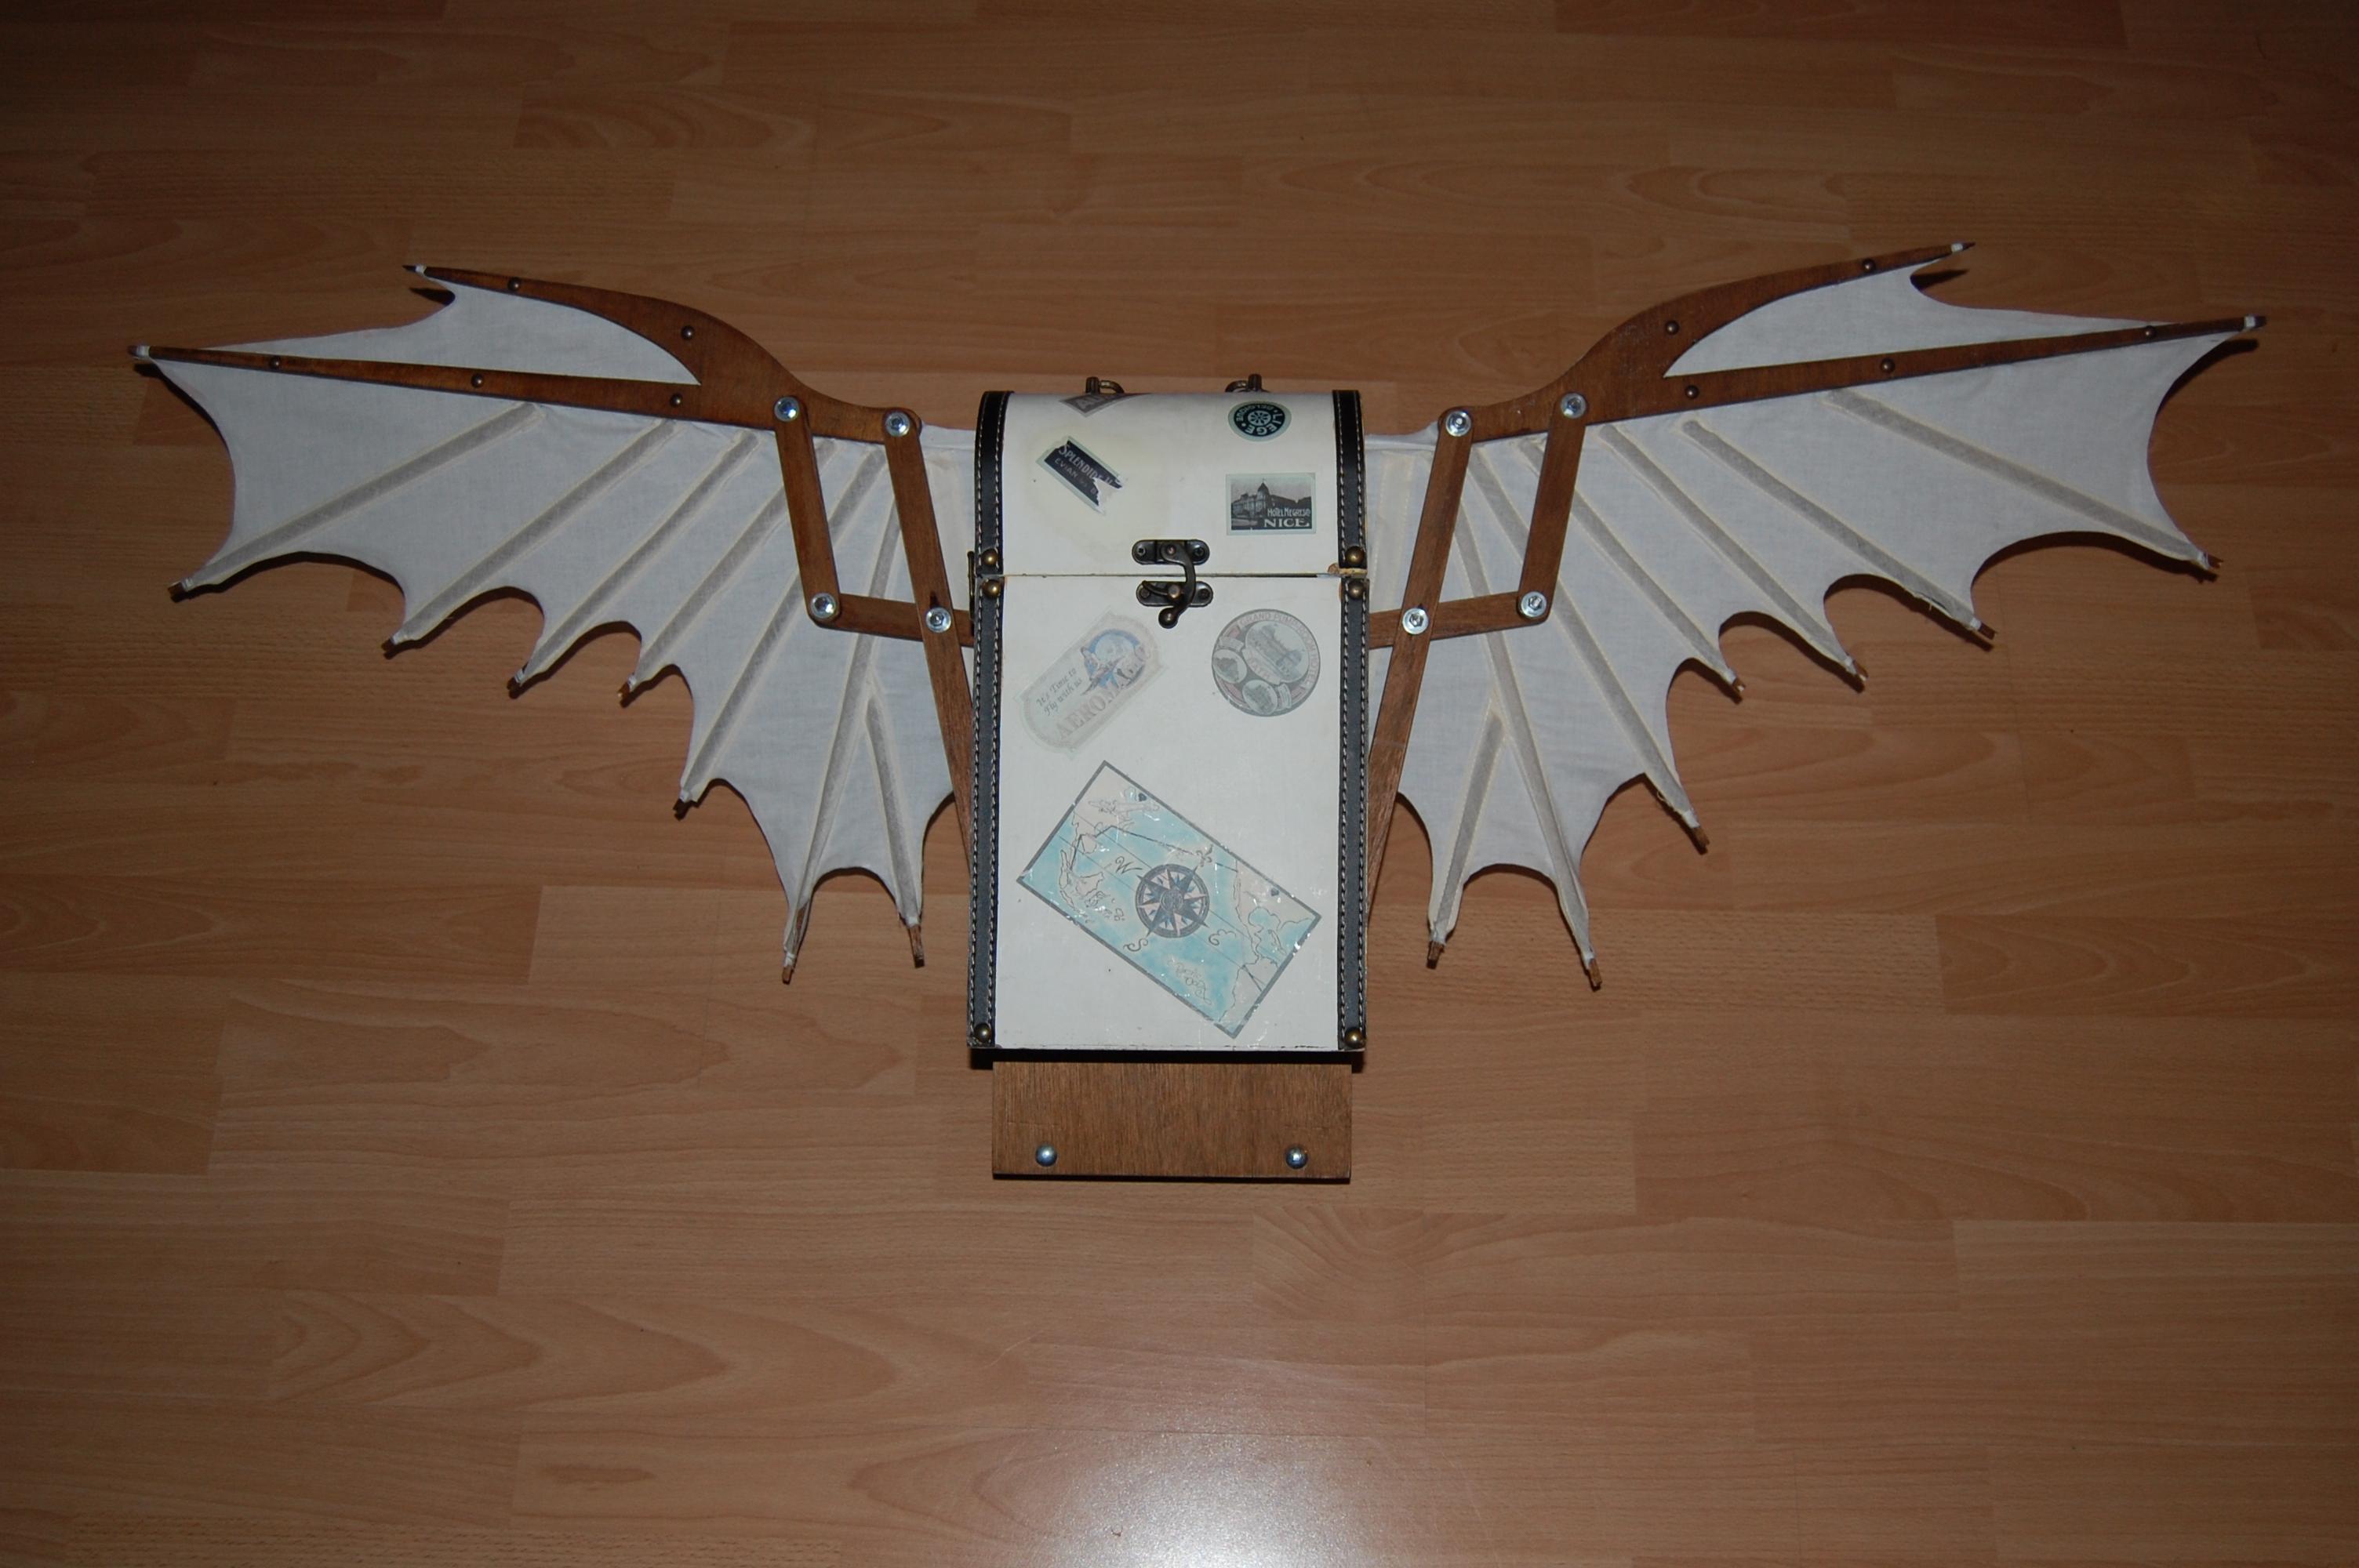 Steampunk auto-folding wings